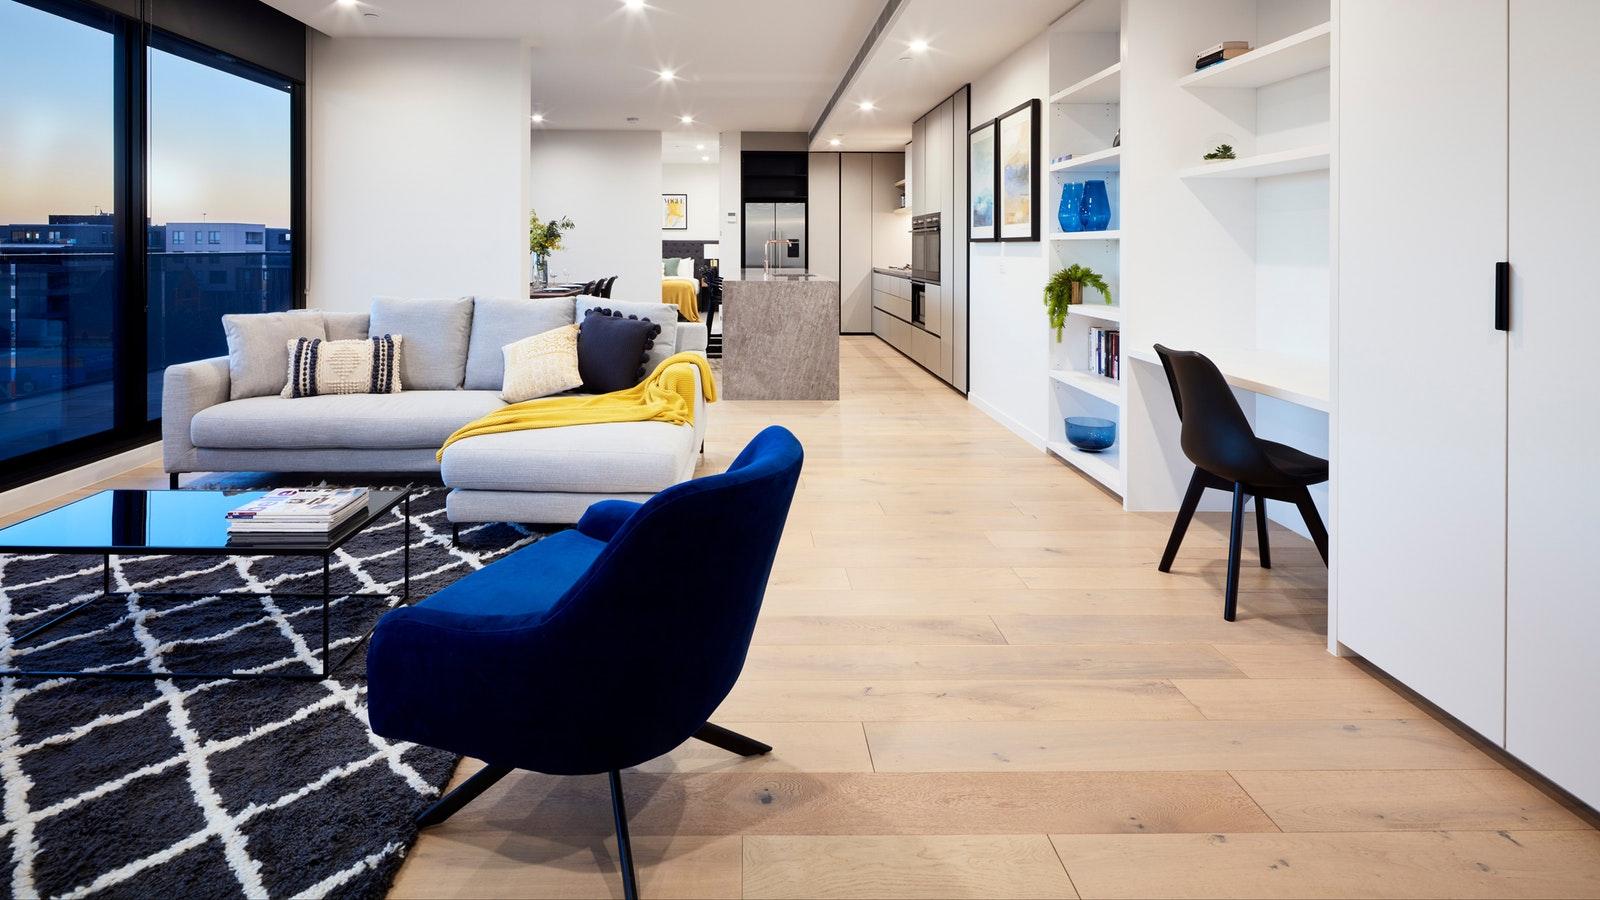 Essendon Luxury accommodation - serviced apartments Essendon - Accommodation Essendon